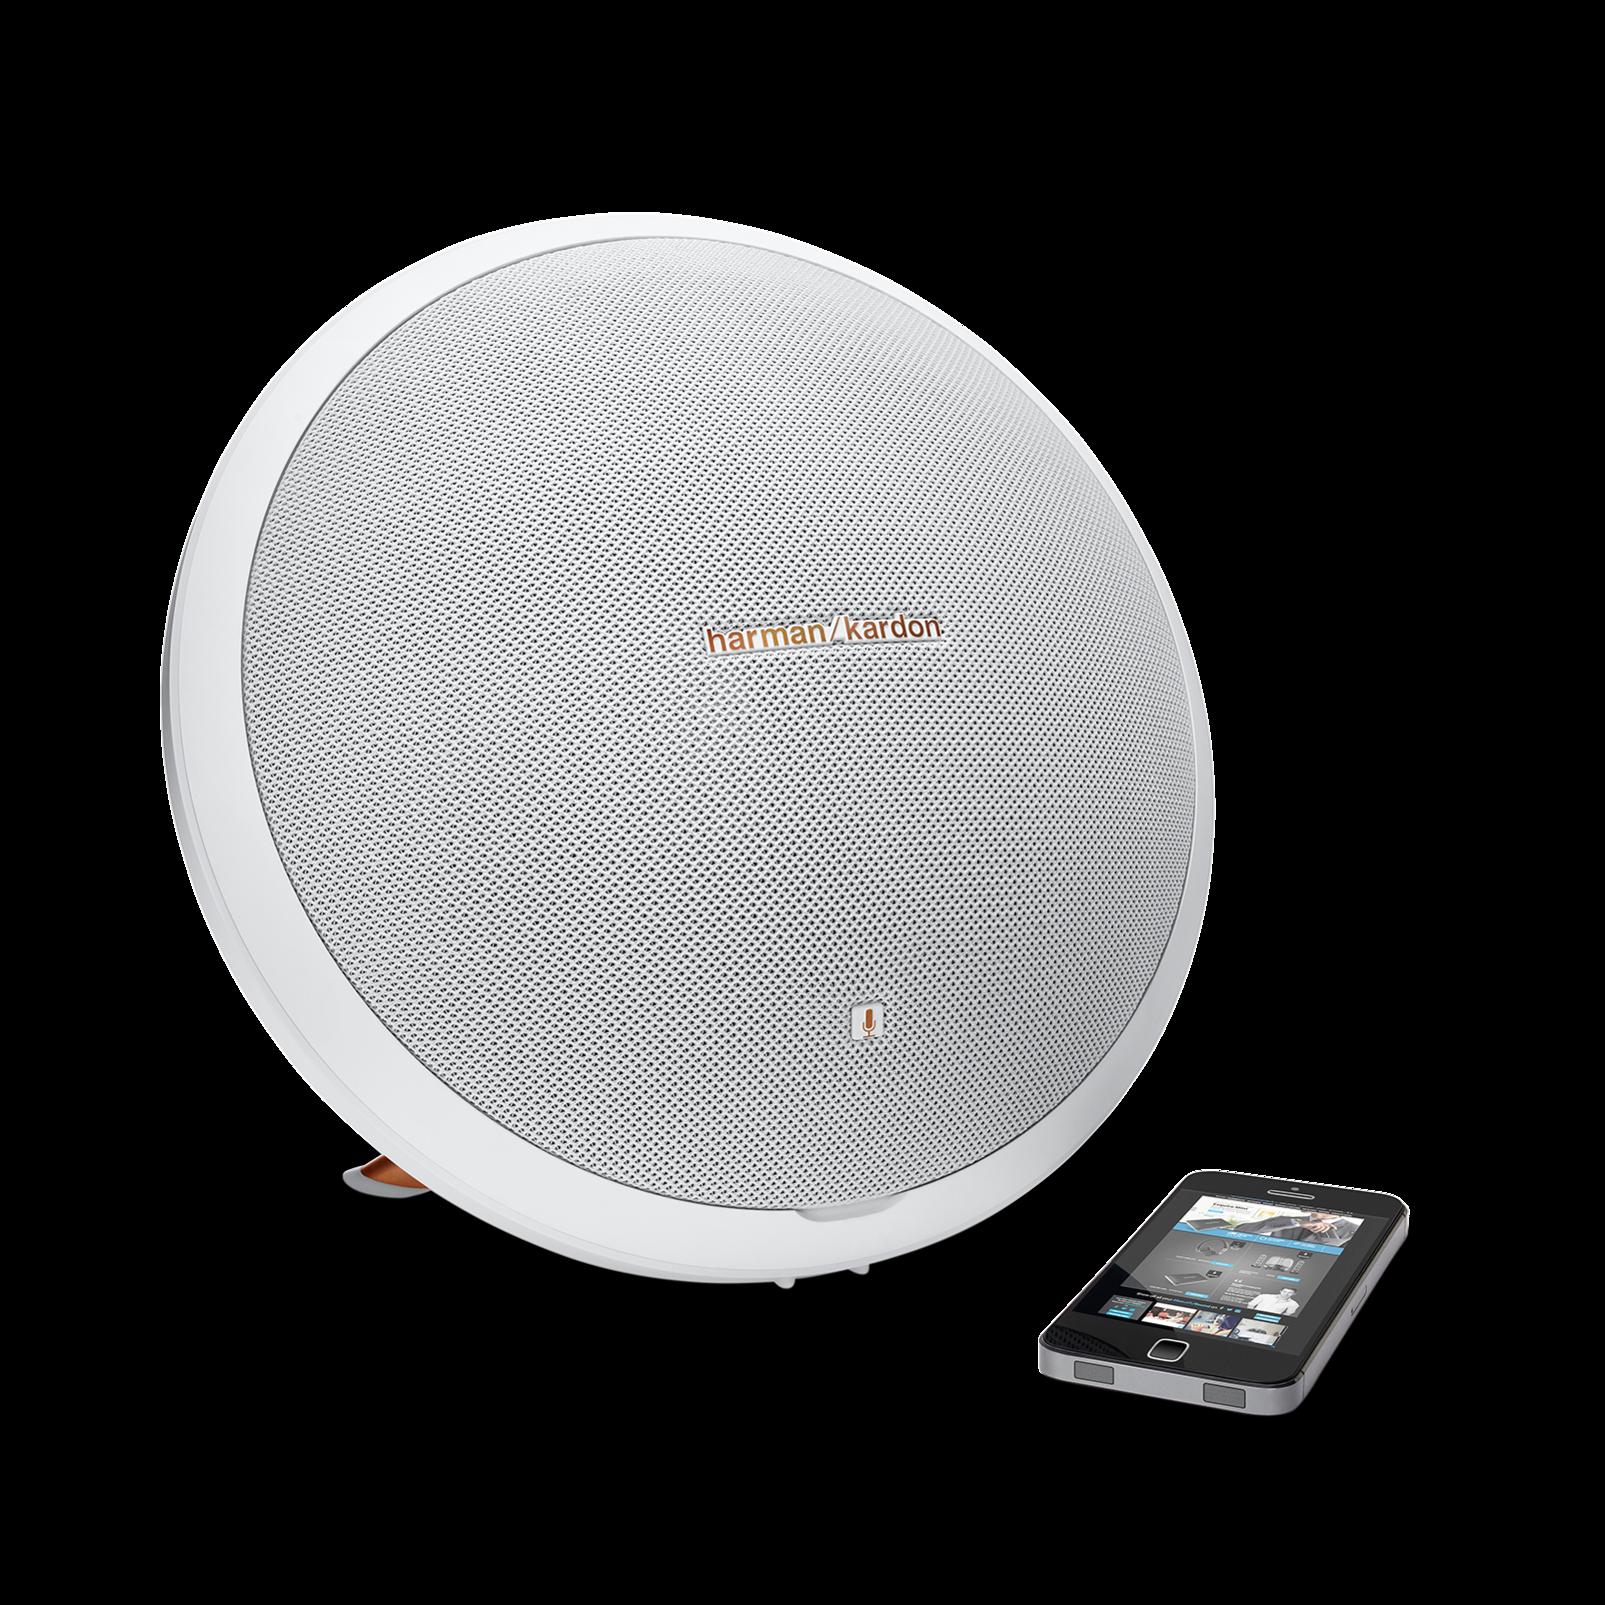 Harman/Kardon Onyx Studio 2 ลำโพงพกพาที่ให้คุณภาพเสียงในระดับ Best-in-class ถ่ายทอดเสียงออกมาได้สะใจถึงอารมณ์ White